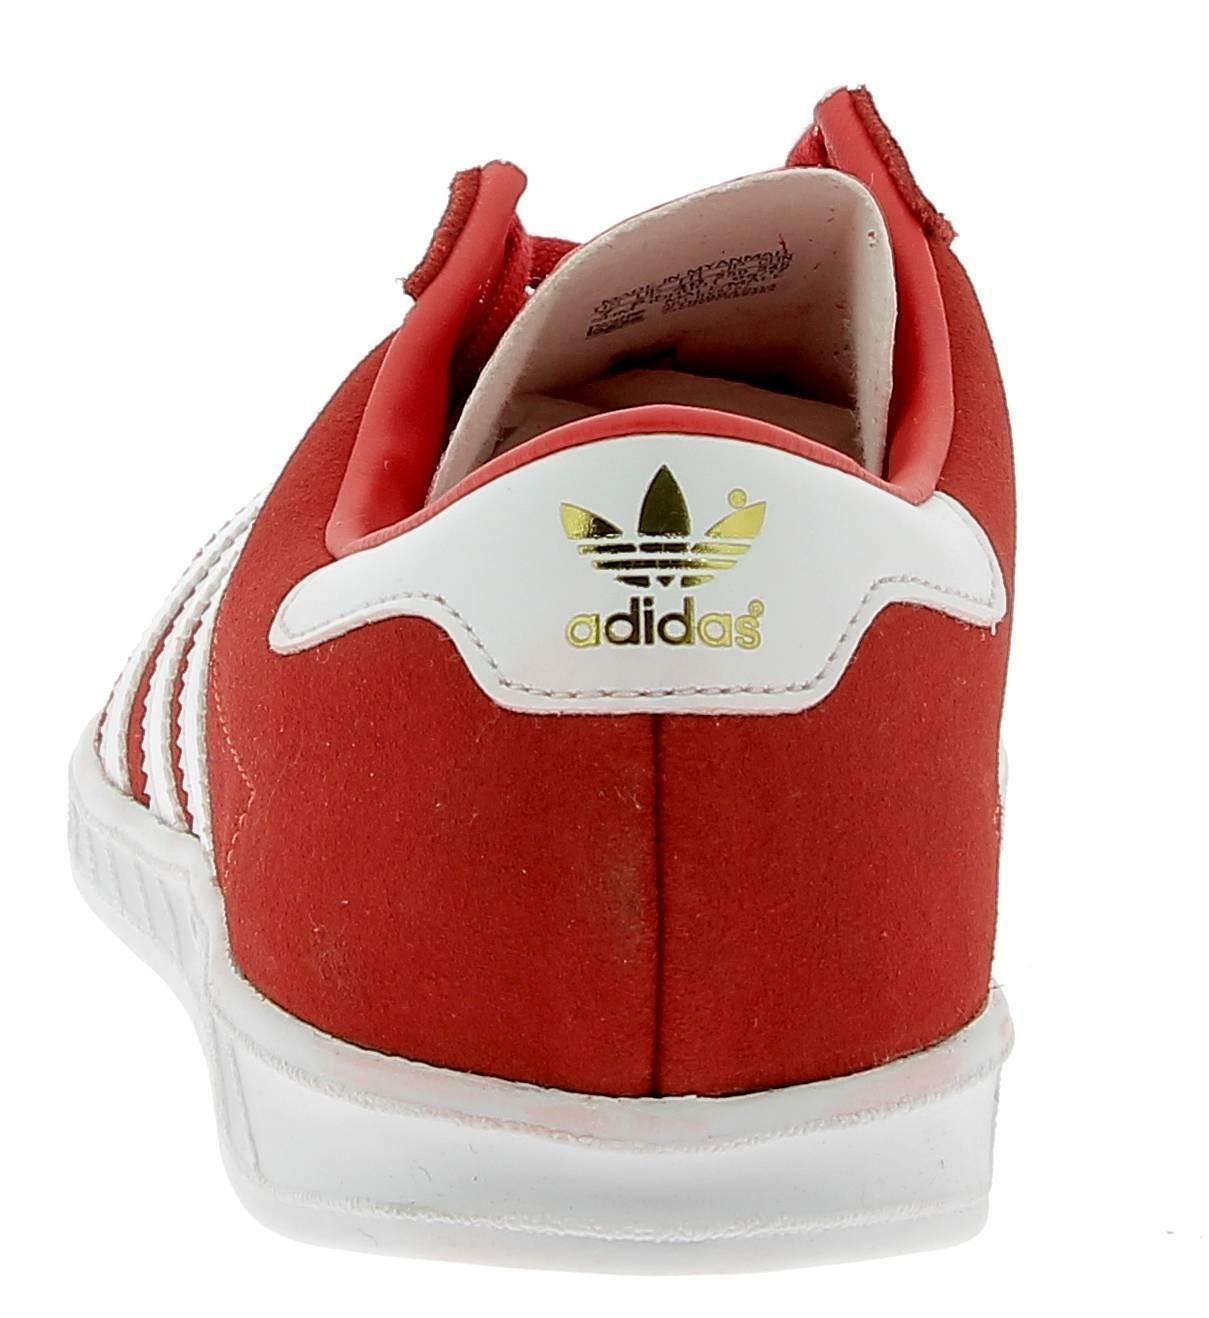 adidas adidas hamburg scarpe sportive uomo rosse